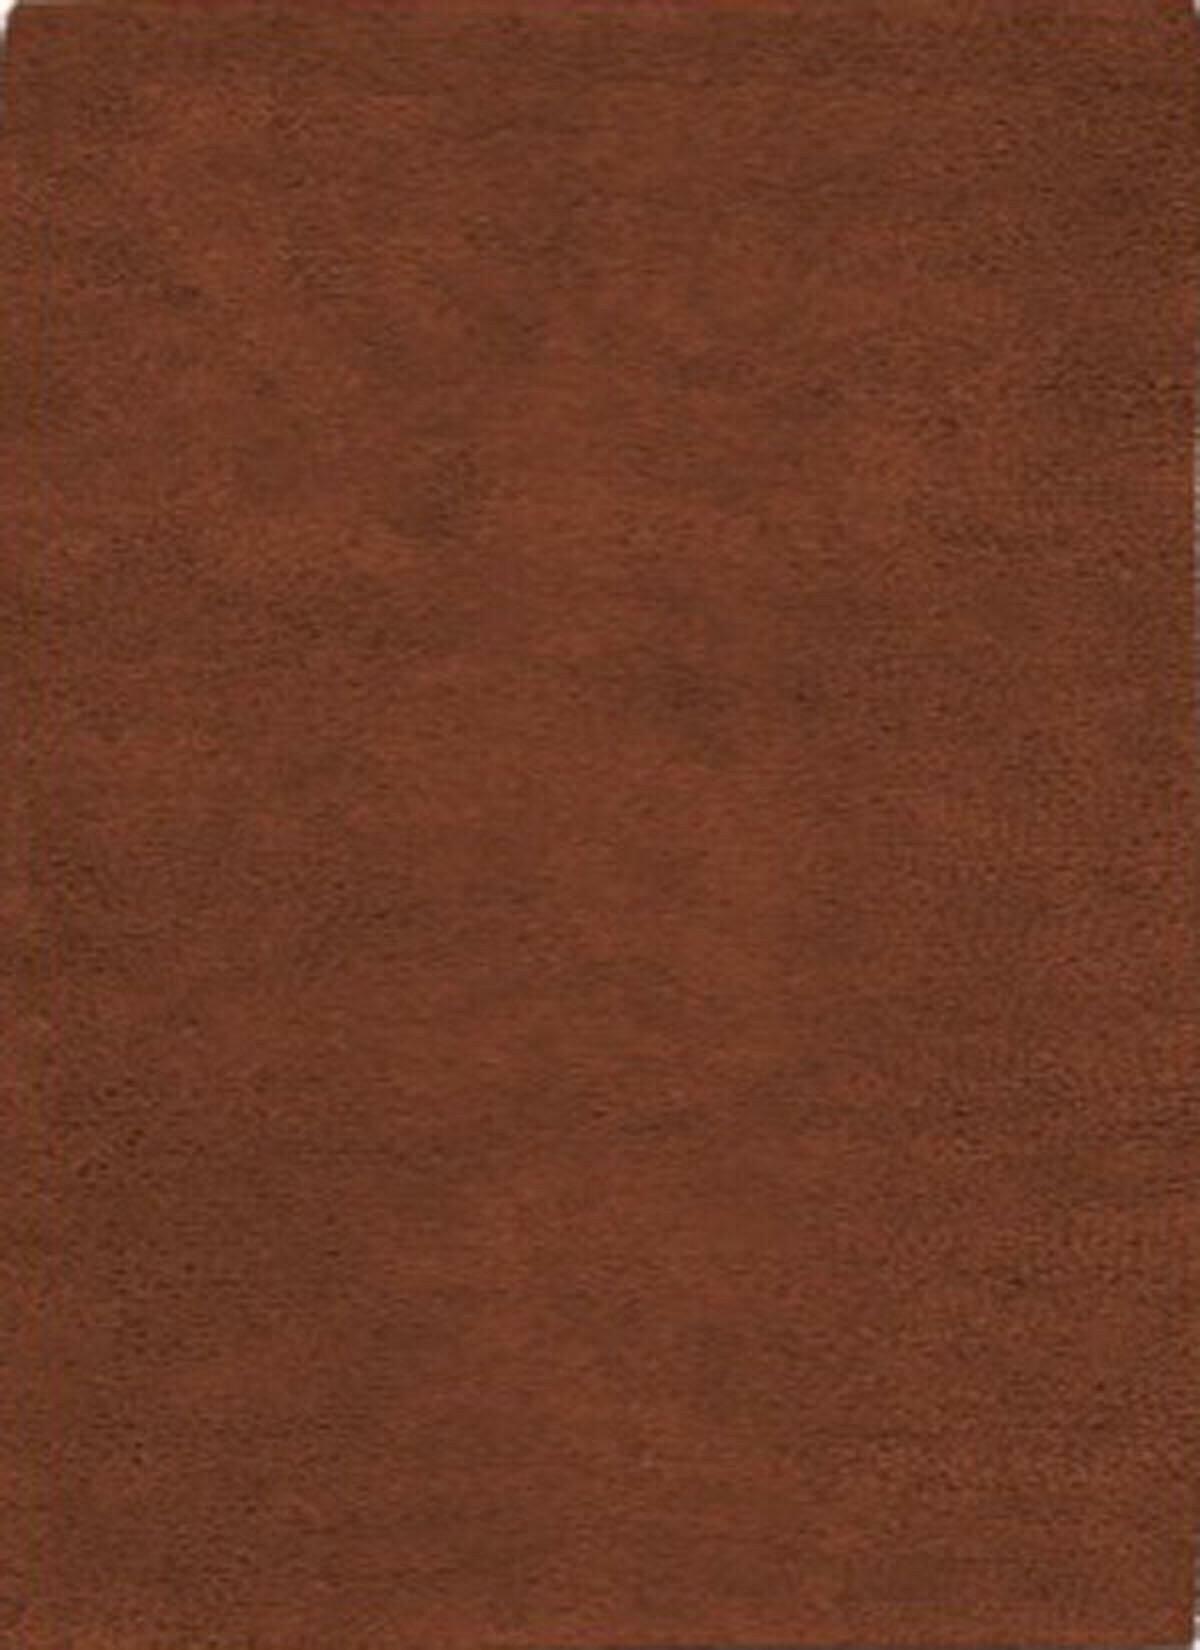 Henley Hand-Tufted Rust Area Rug Rug Size: 3' x 5'